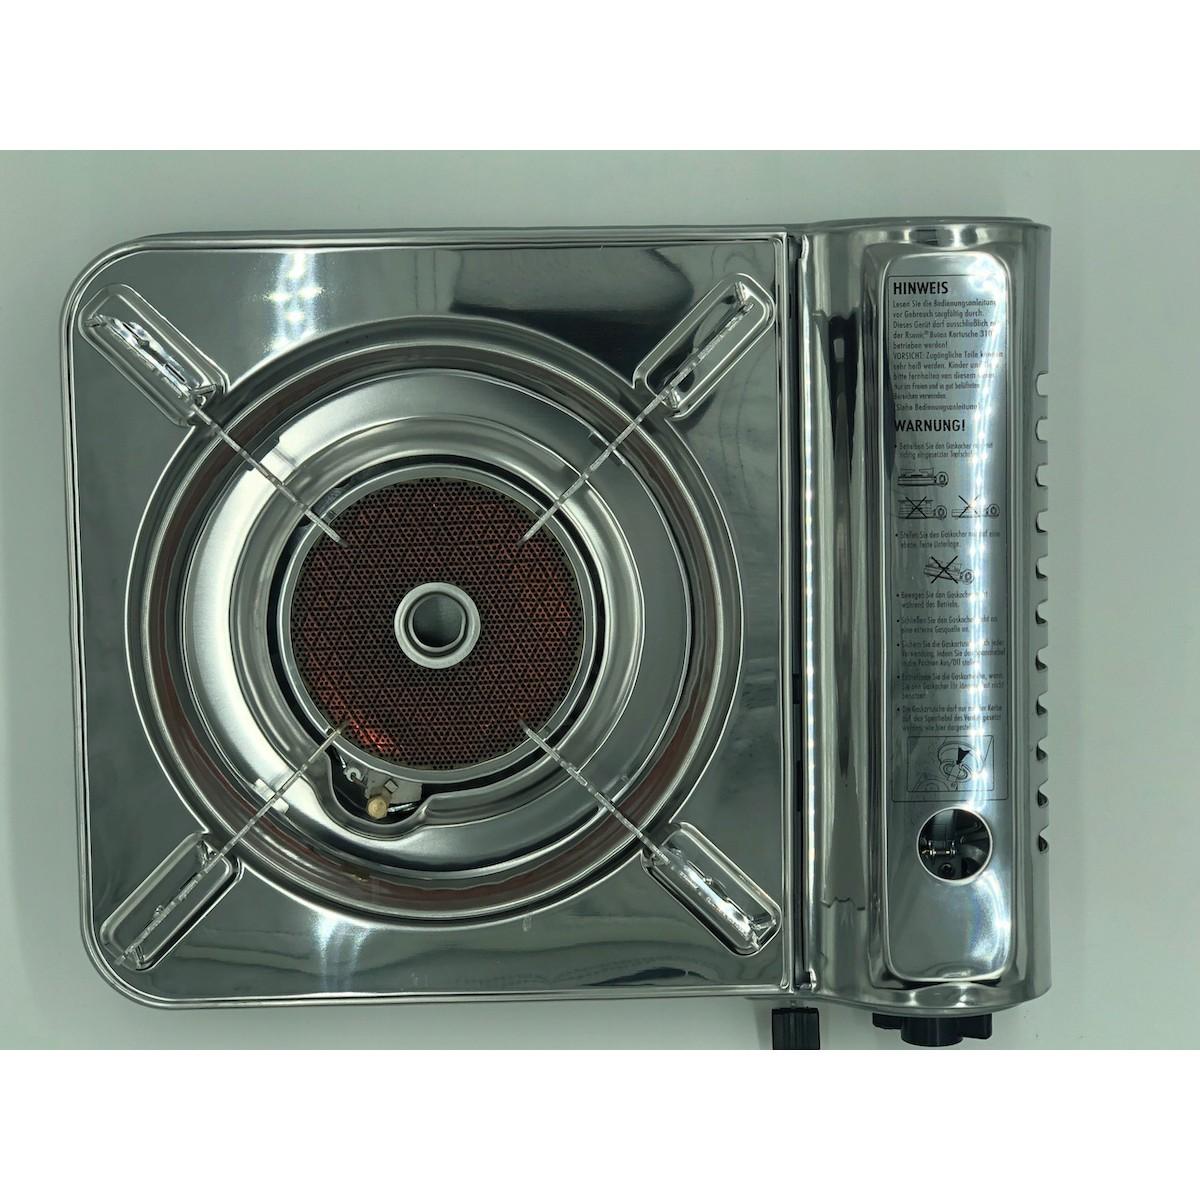 Plynový varič na kartuše s keramickým panelom megamix.sk